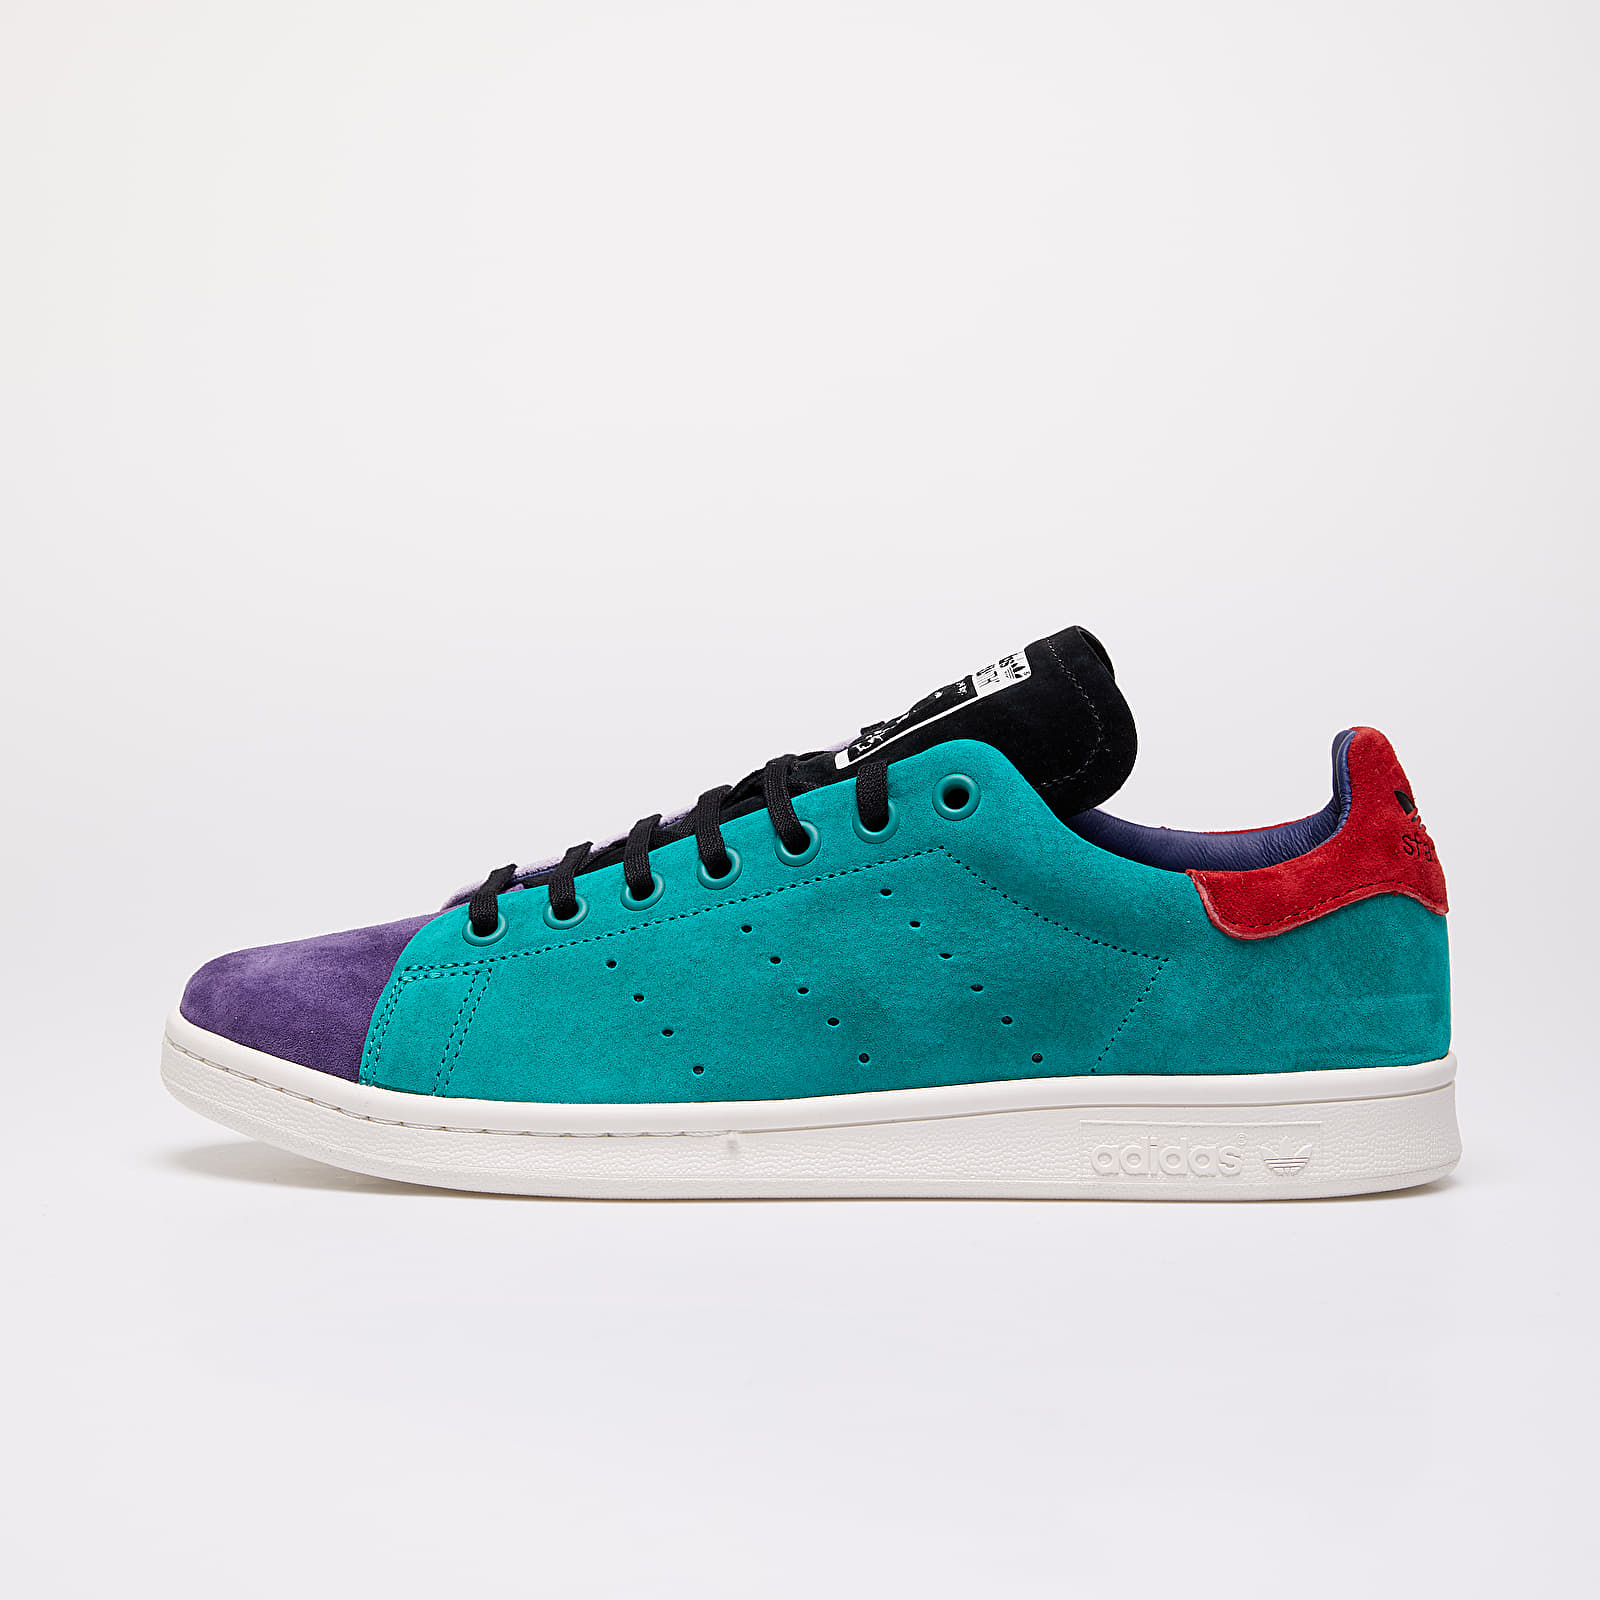 Pánské tenisky a boty adidas Stan Smith Recon Vapor Pink/ Tactile Steel/ Lust Blue